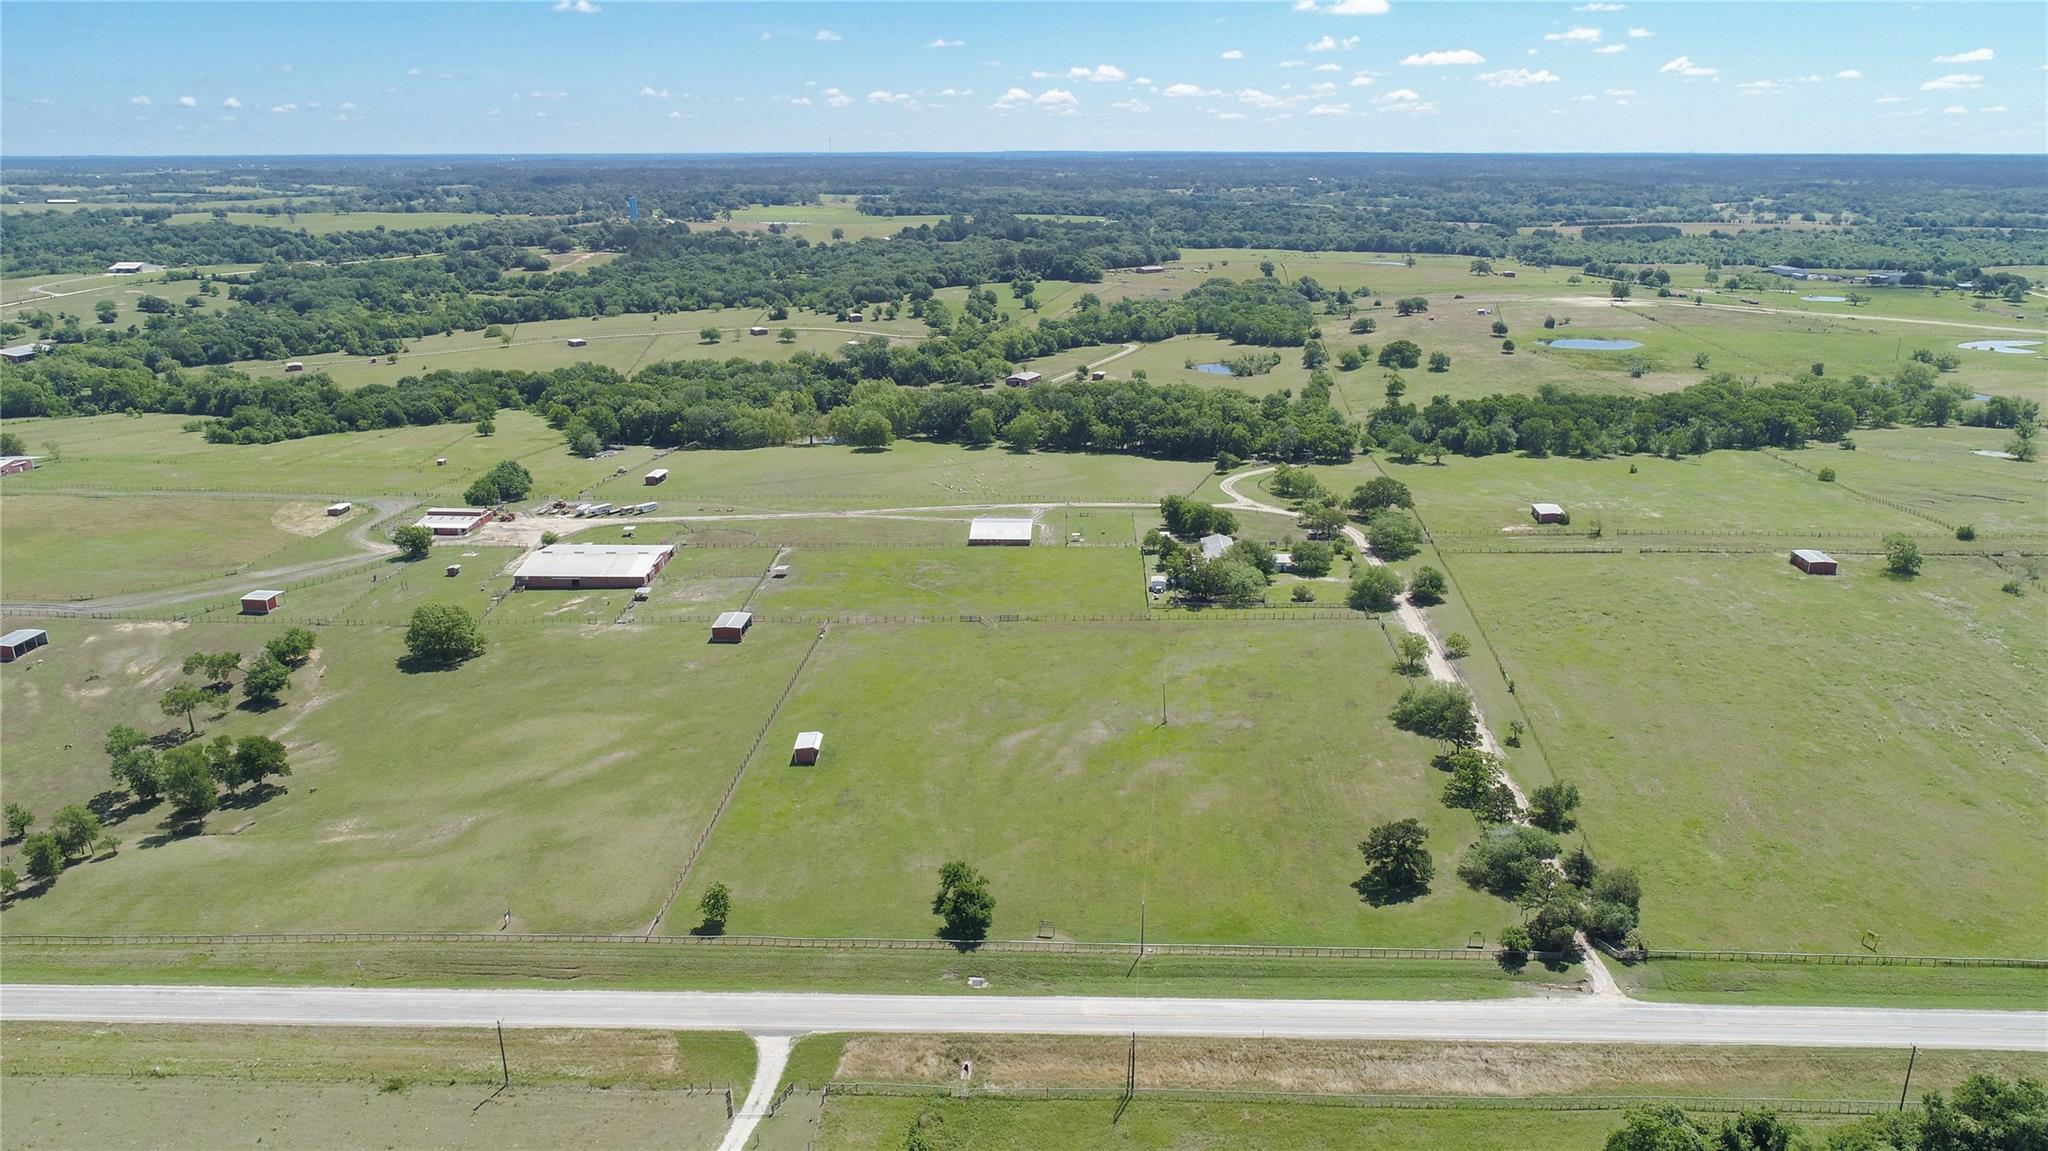 12409 FM 362 - 32 Acres Property Photo - Navasota, TX real estate listing